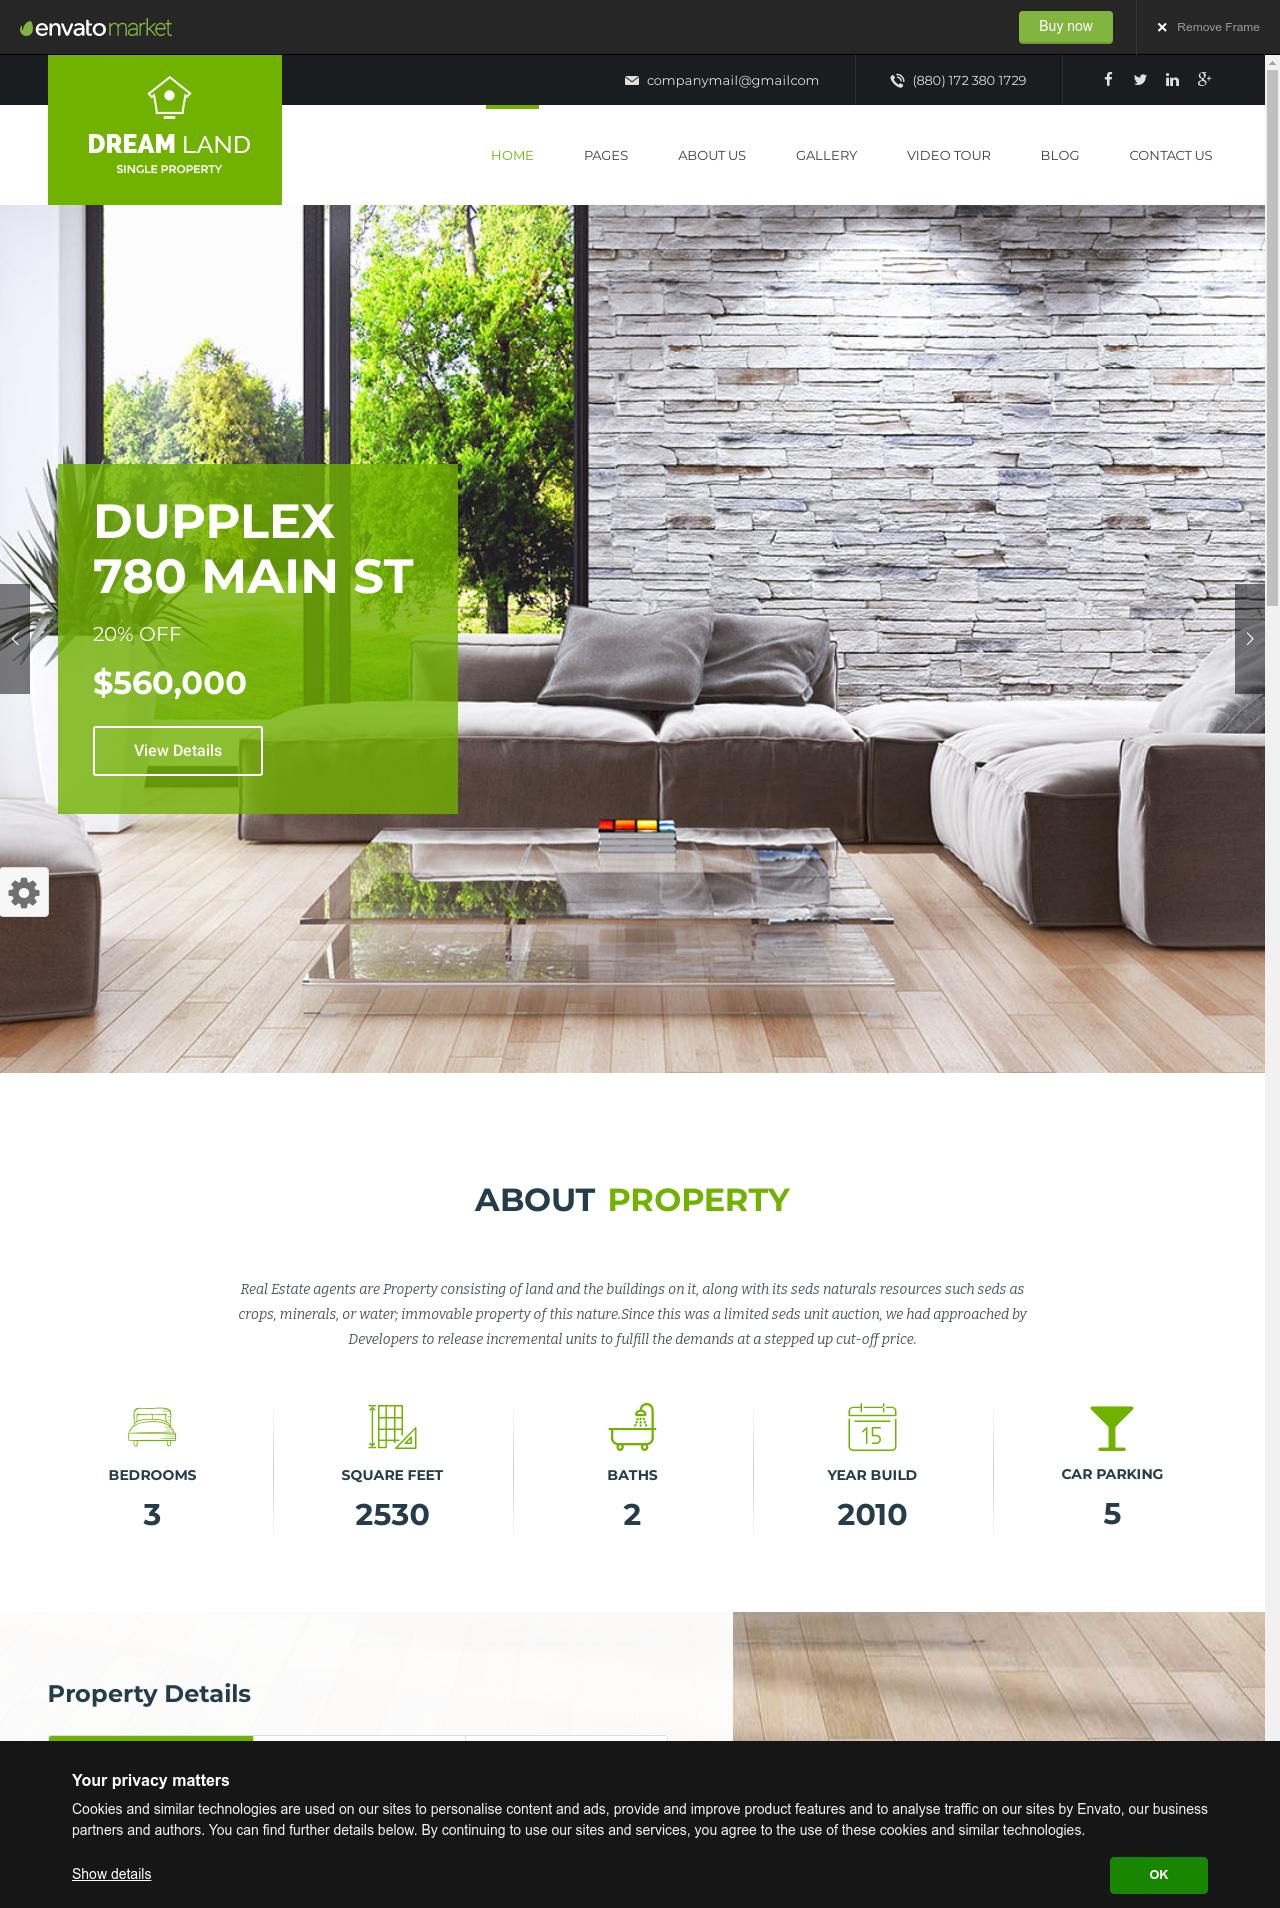 DREAM LAND Single Property Real Estate WordPress Theme